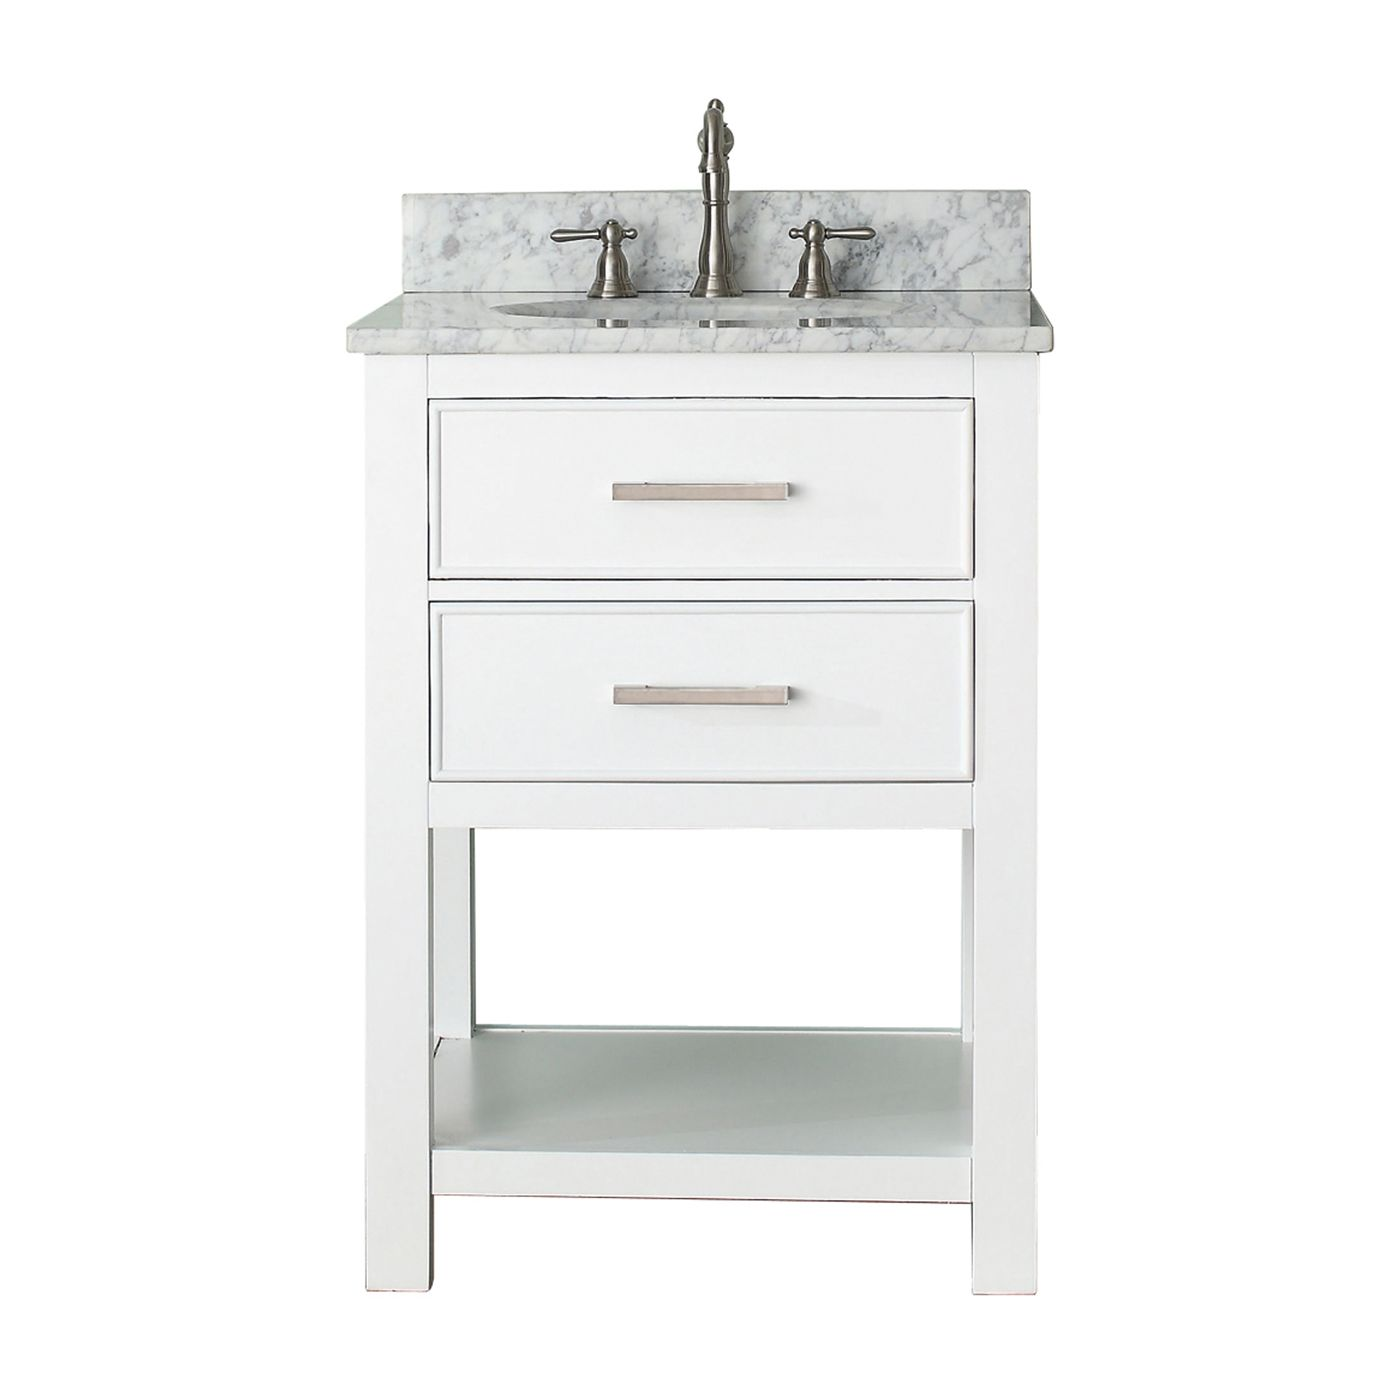 shop avanity brooks vs24 brooks 24 in bathroom vanity on lowes vanity id=29331